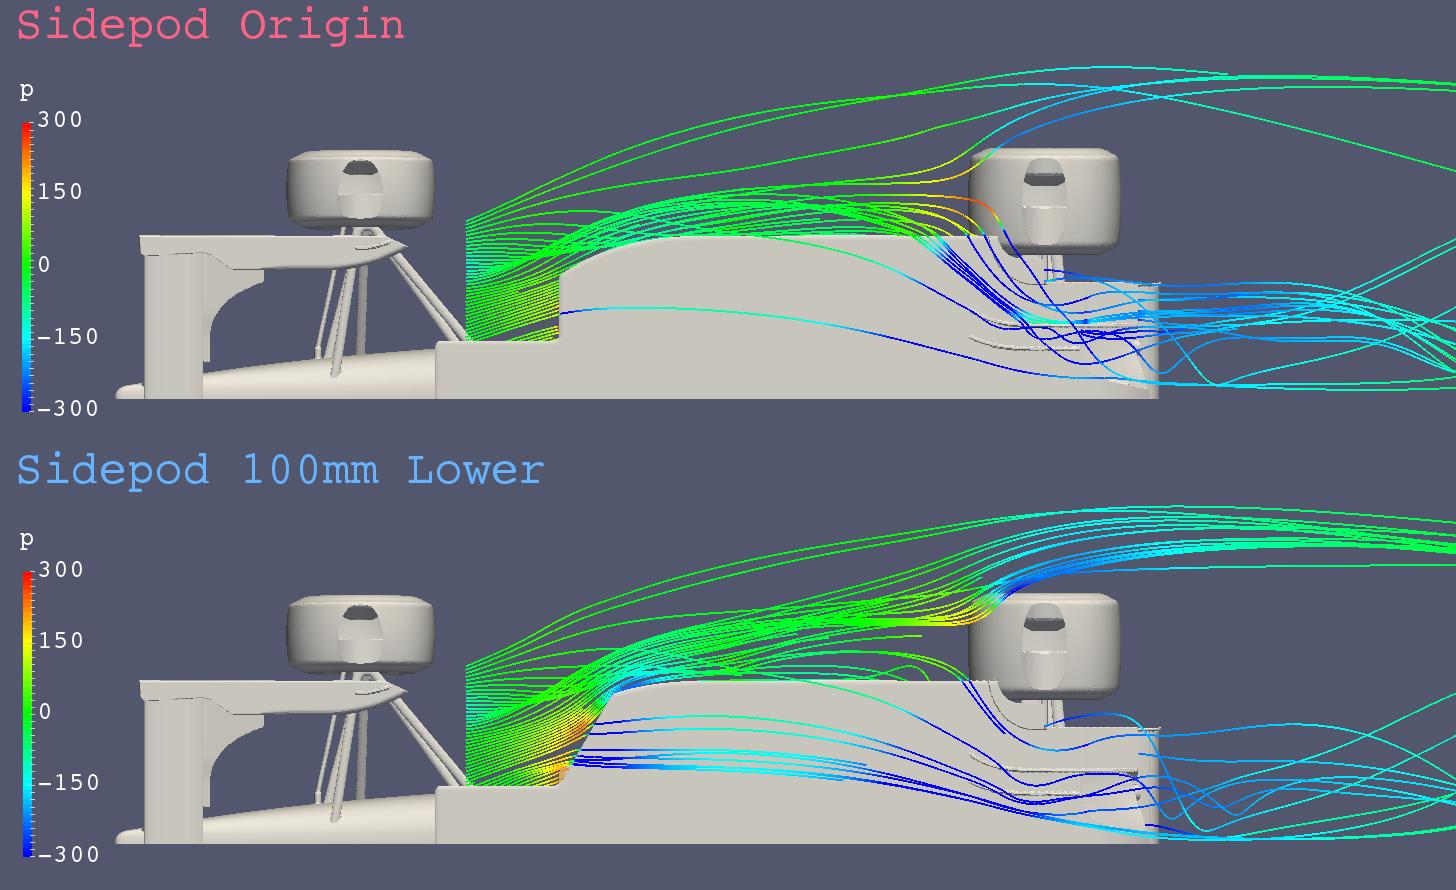 f92at_cfd_streamlines-around-floor_x0450-z0060